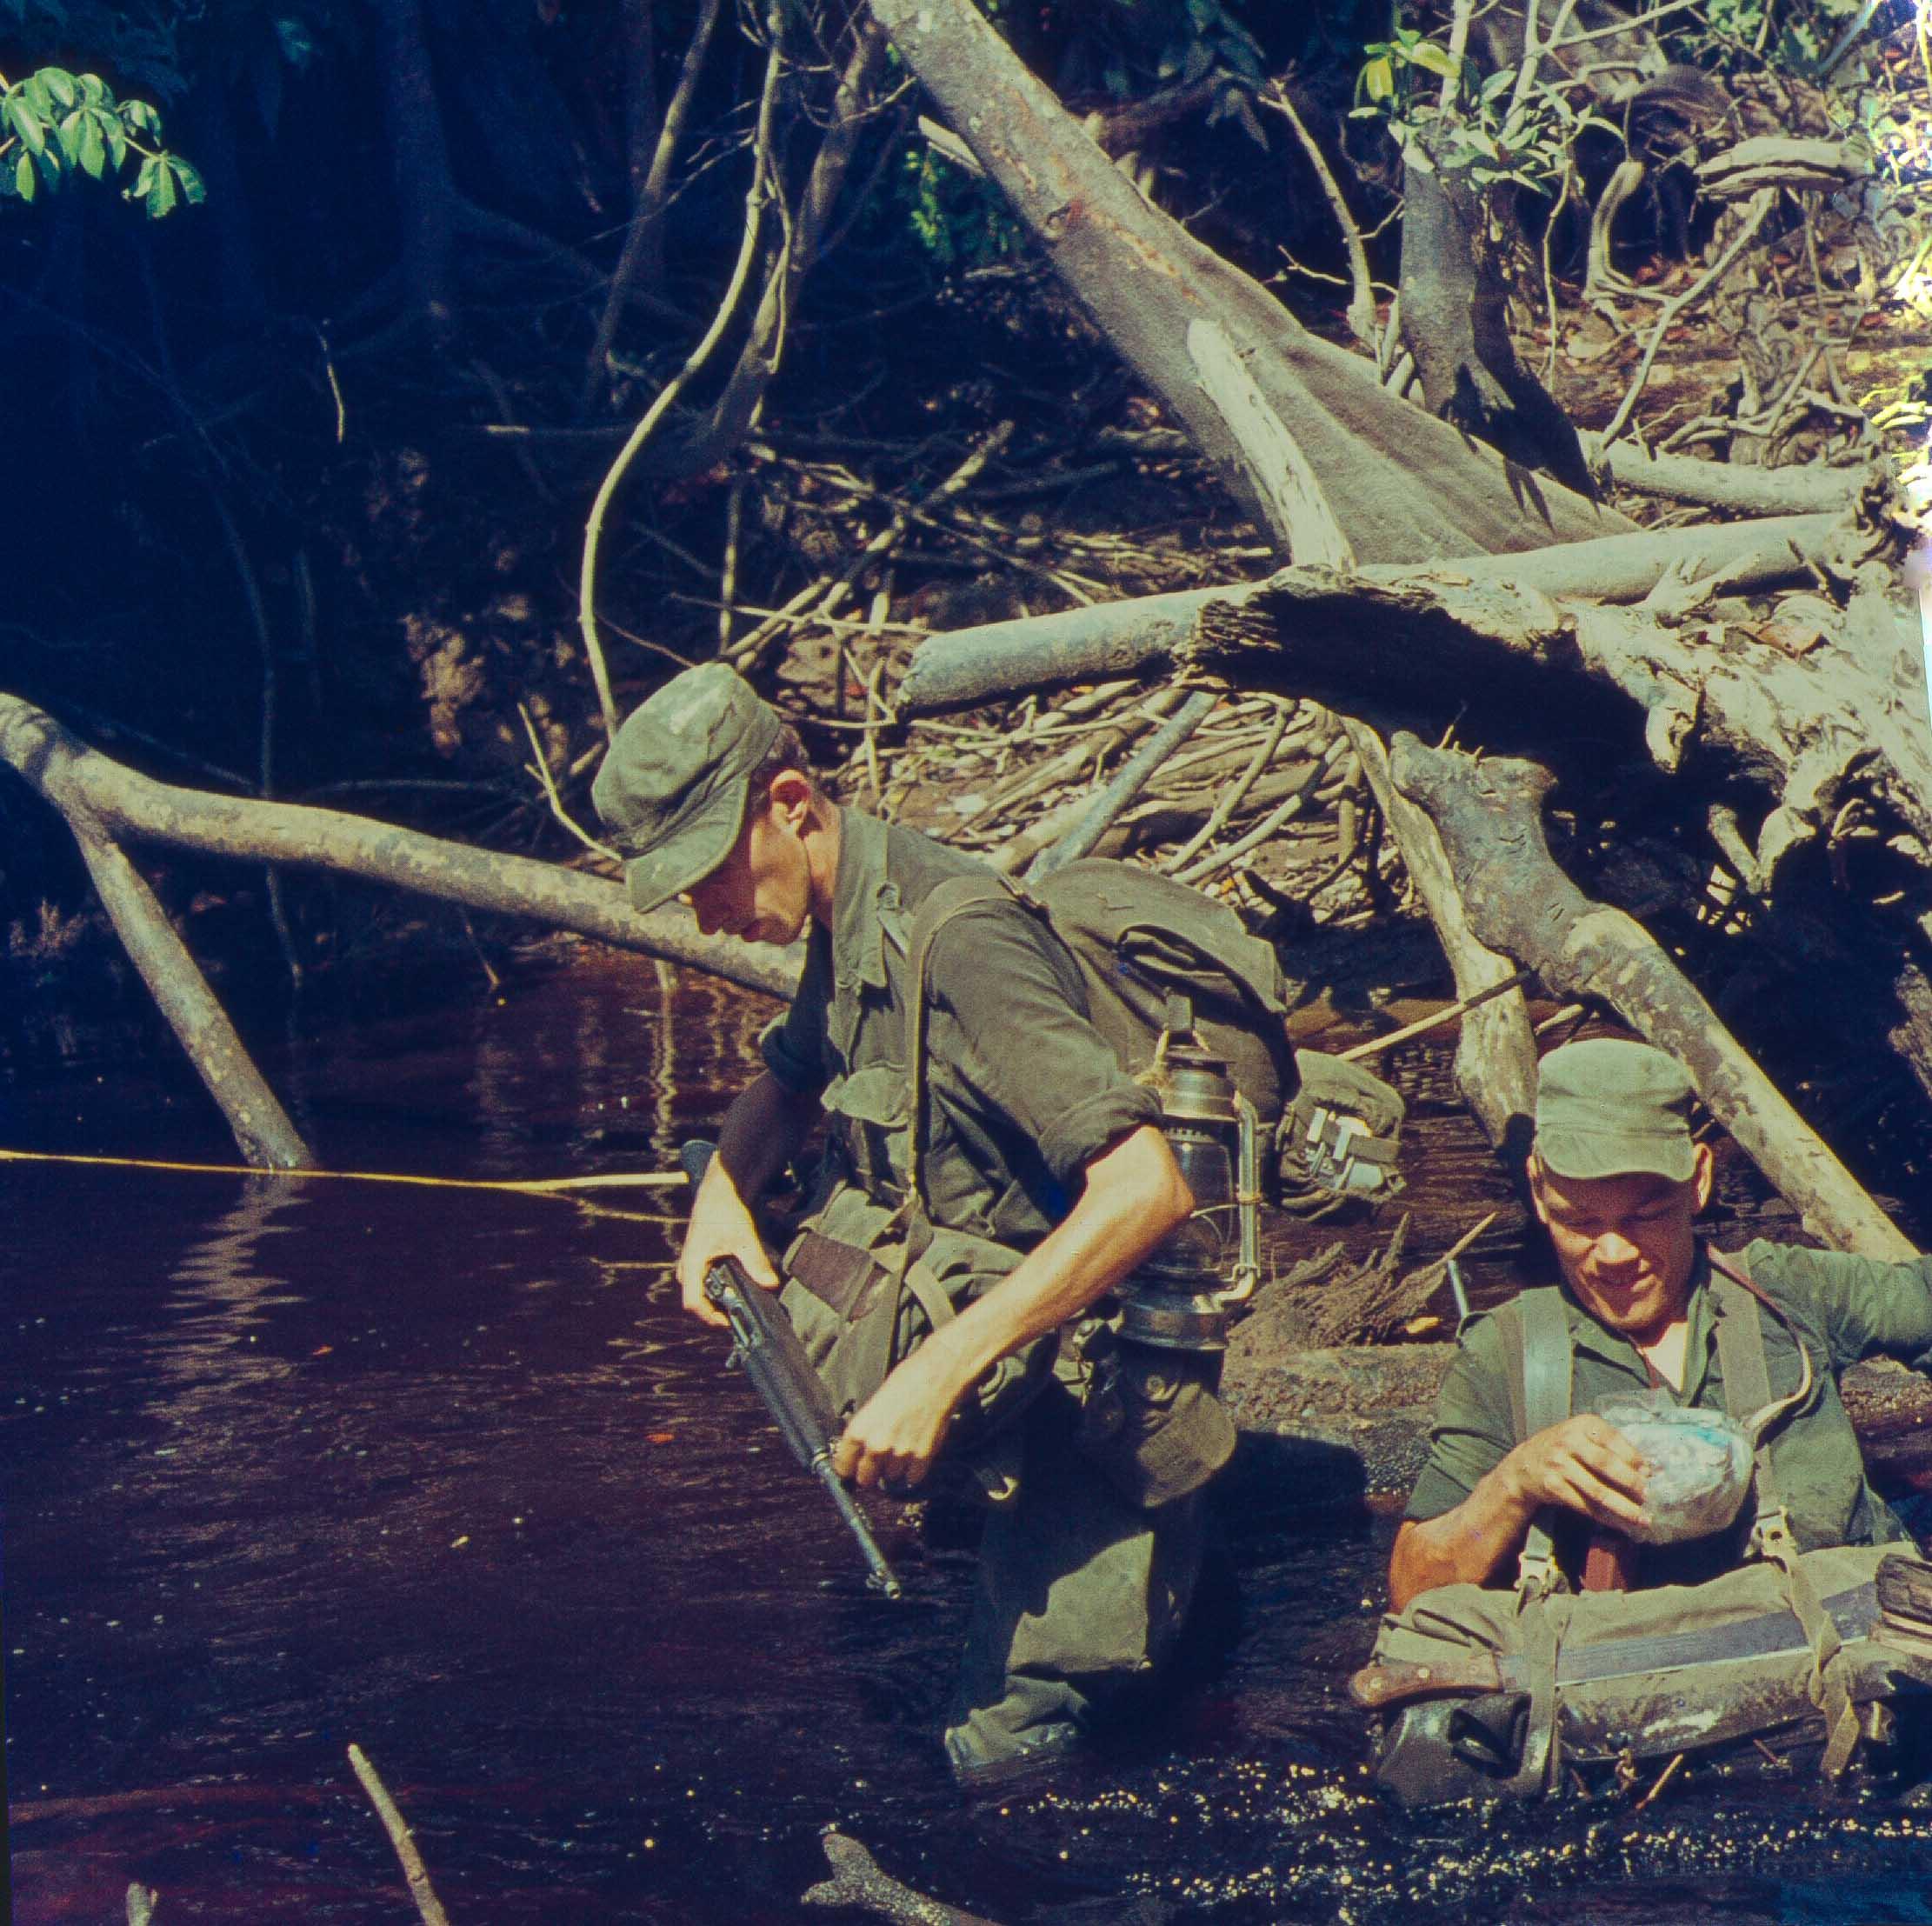 382. Suriname